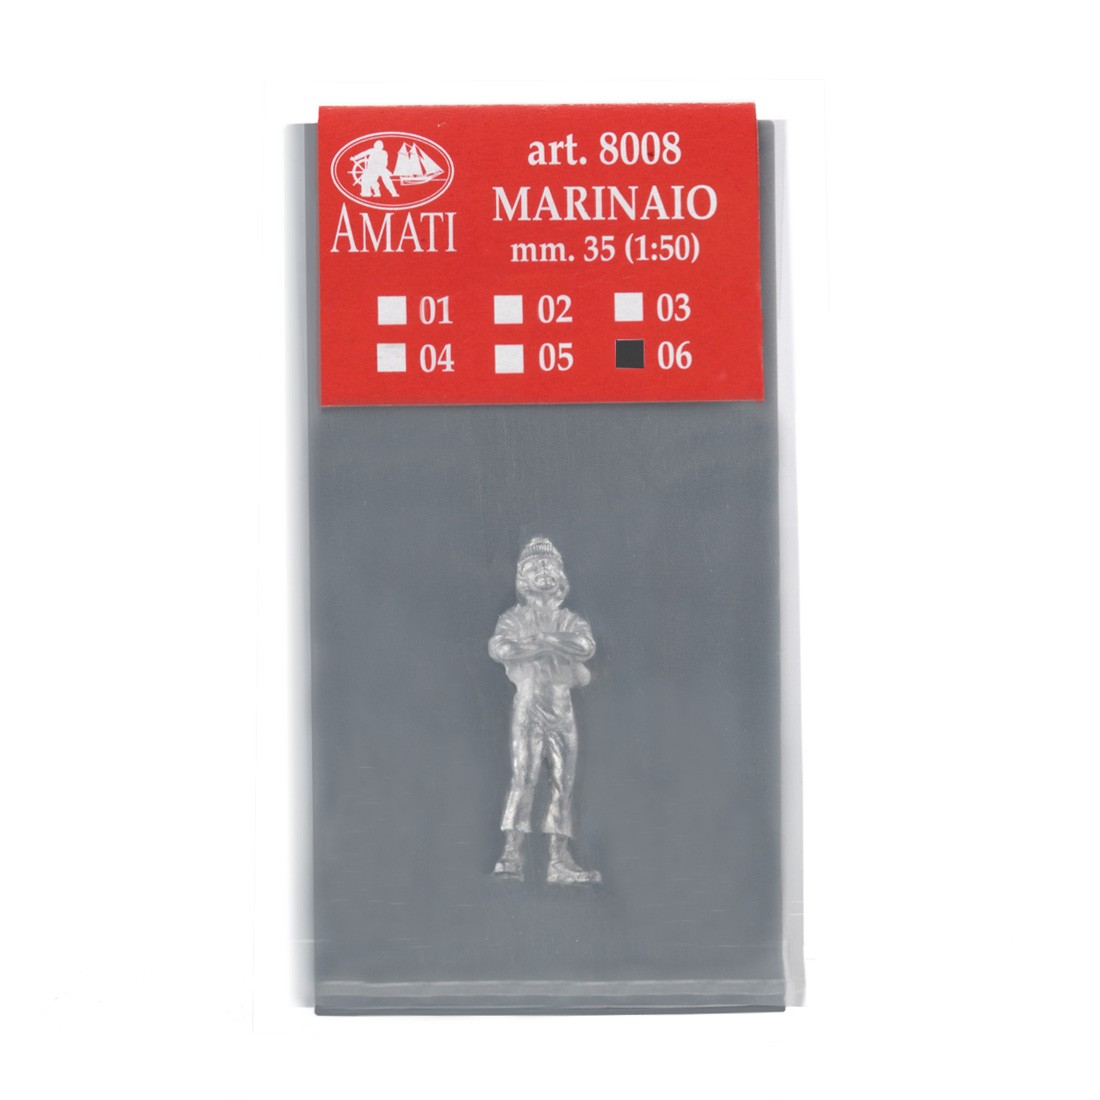 Marinaio mm.35